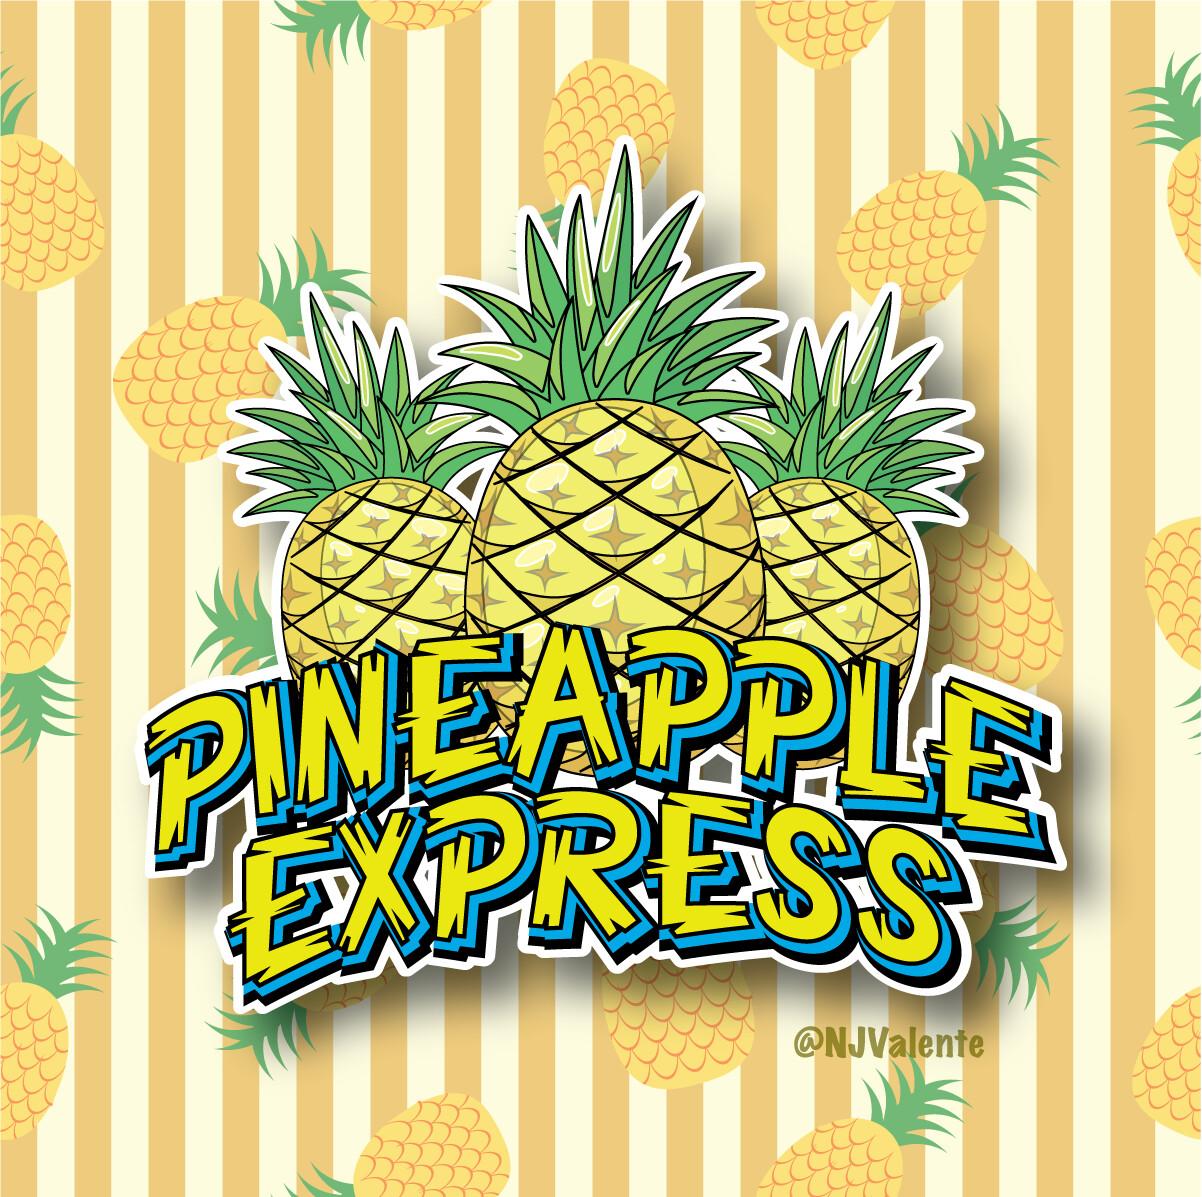 Pineapple Express Cannabis Logo Design, version 2.